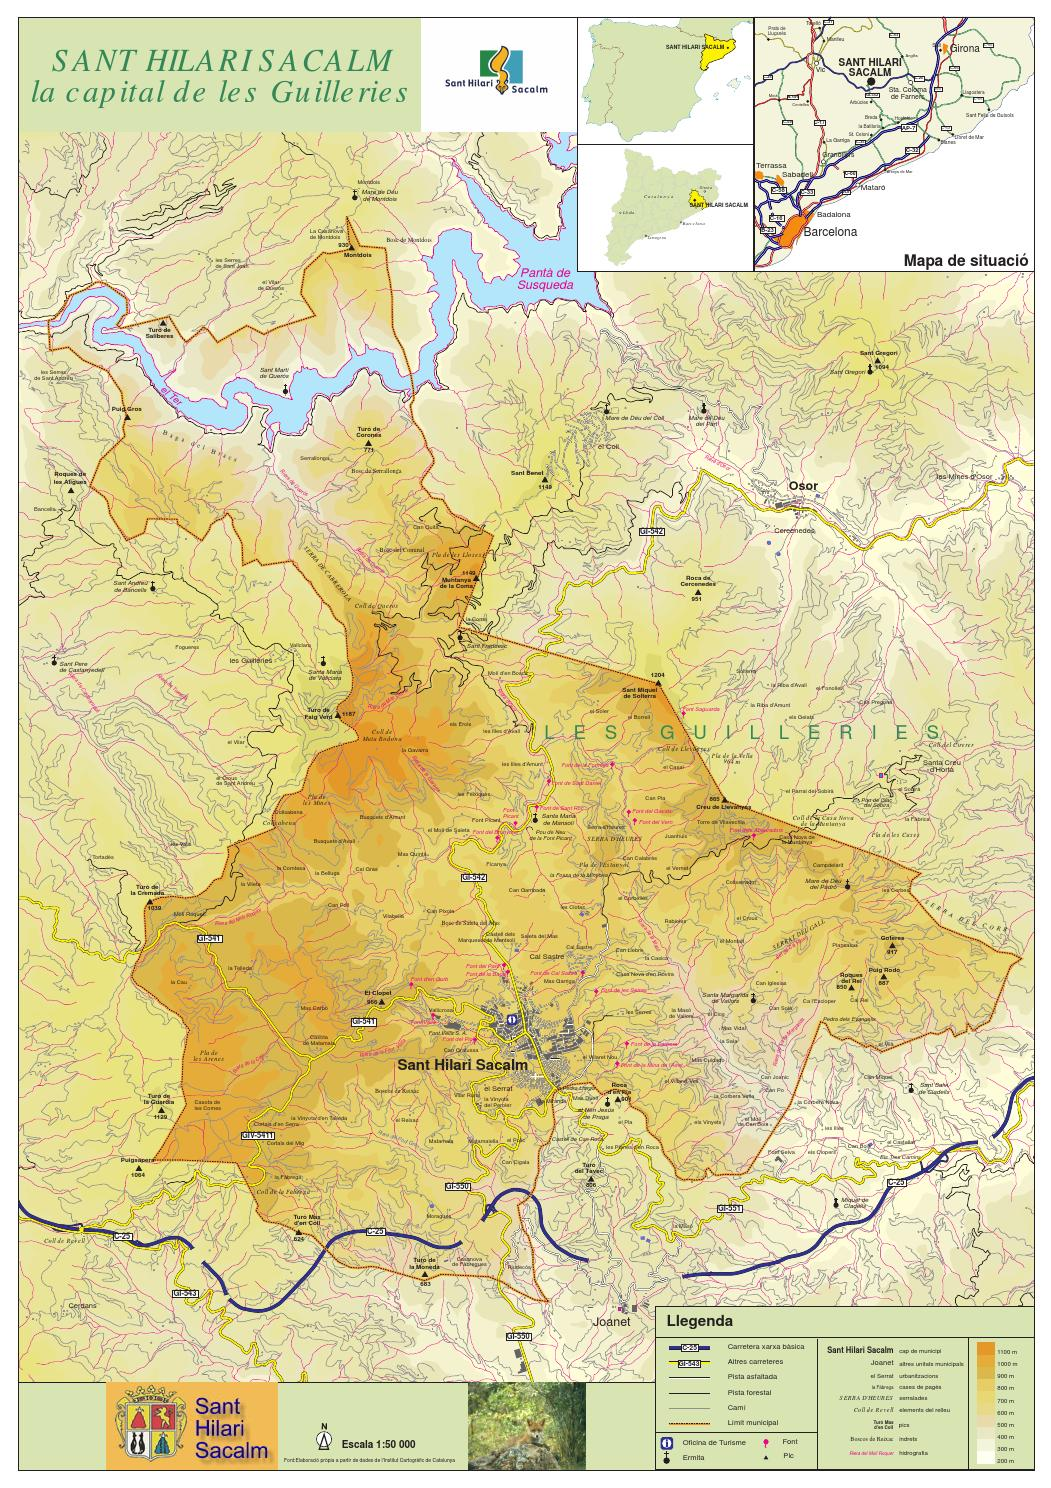 Sant Hilari Sacalm Mapa.Mapa Del Terme De Sant Hilari Sacalm By Narcis Puigderrajols